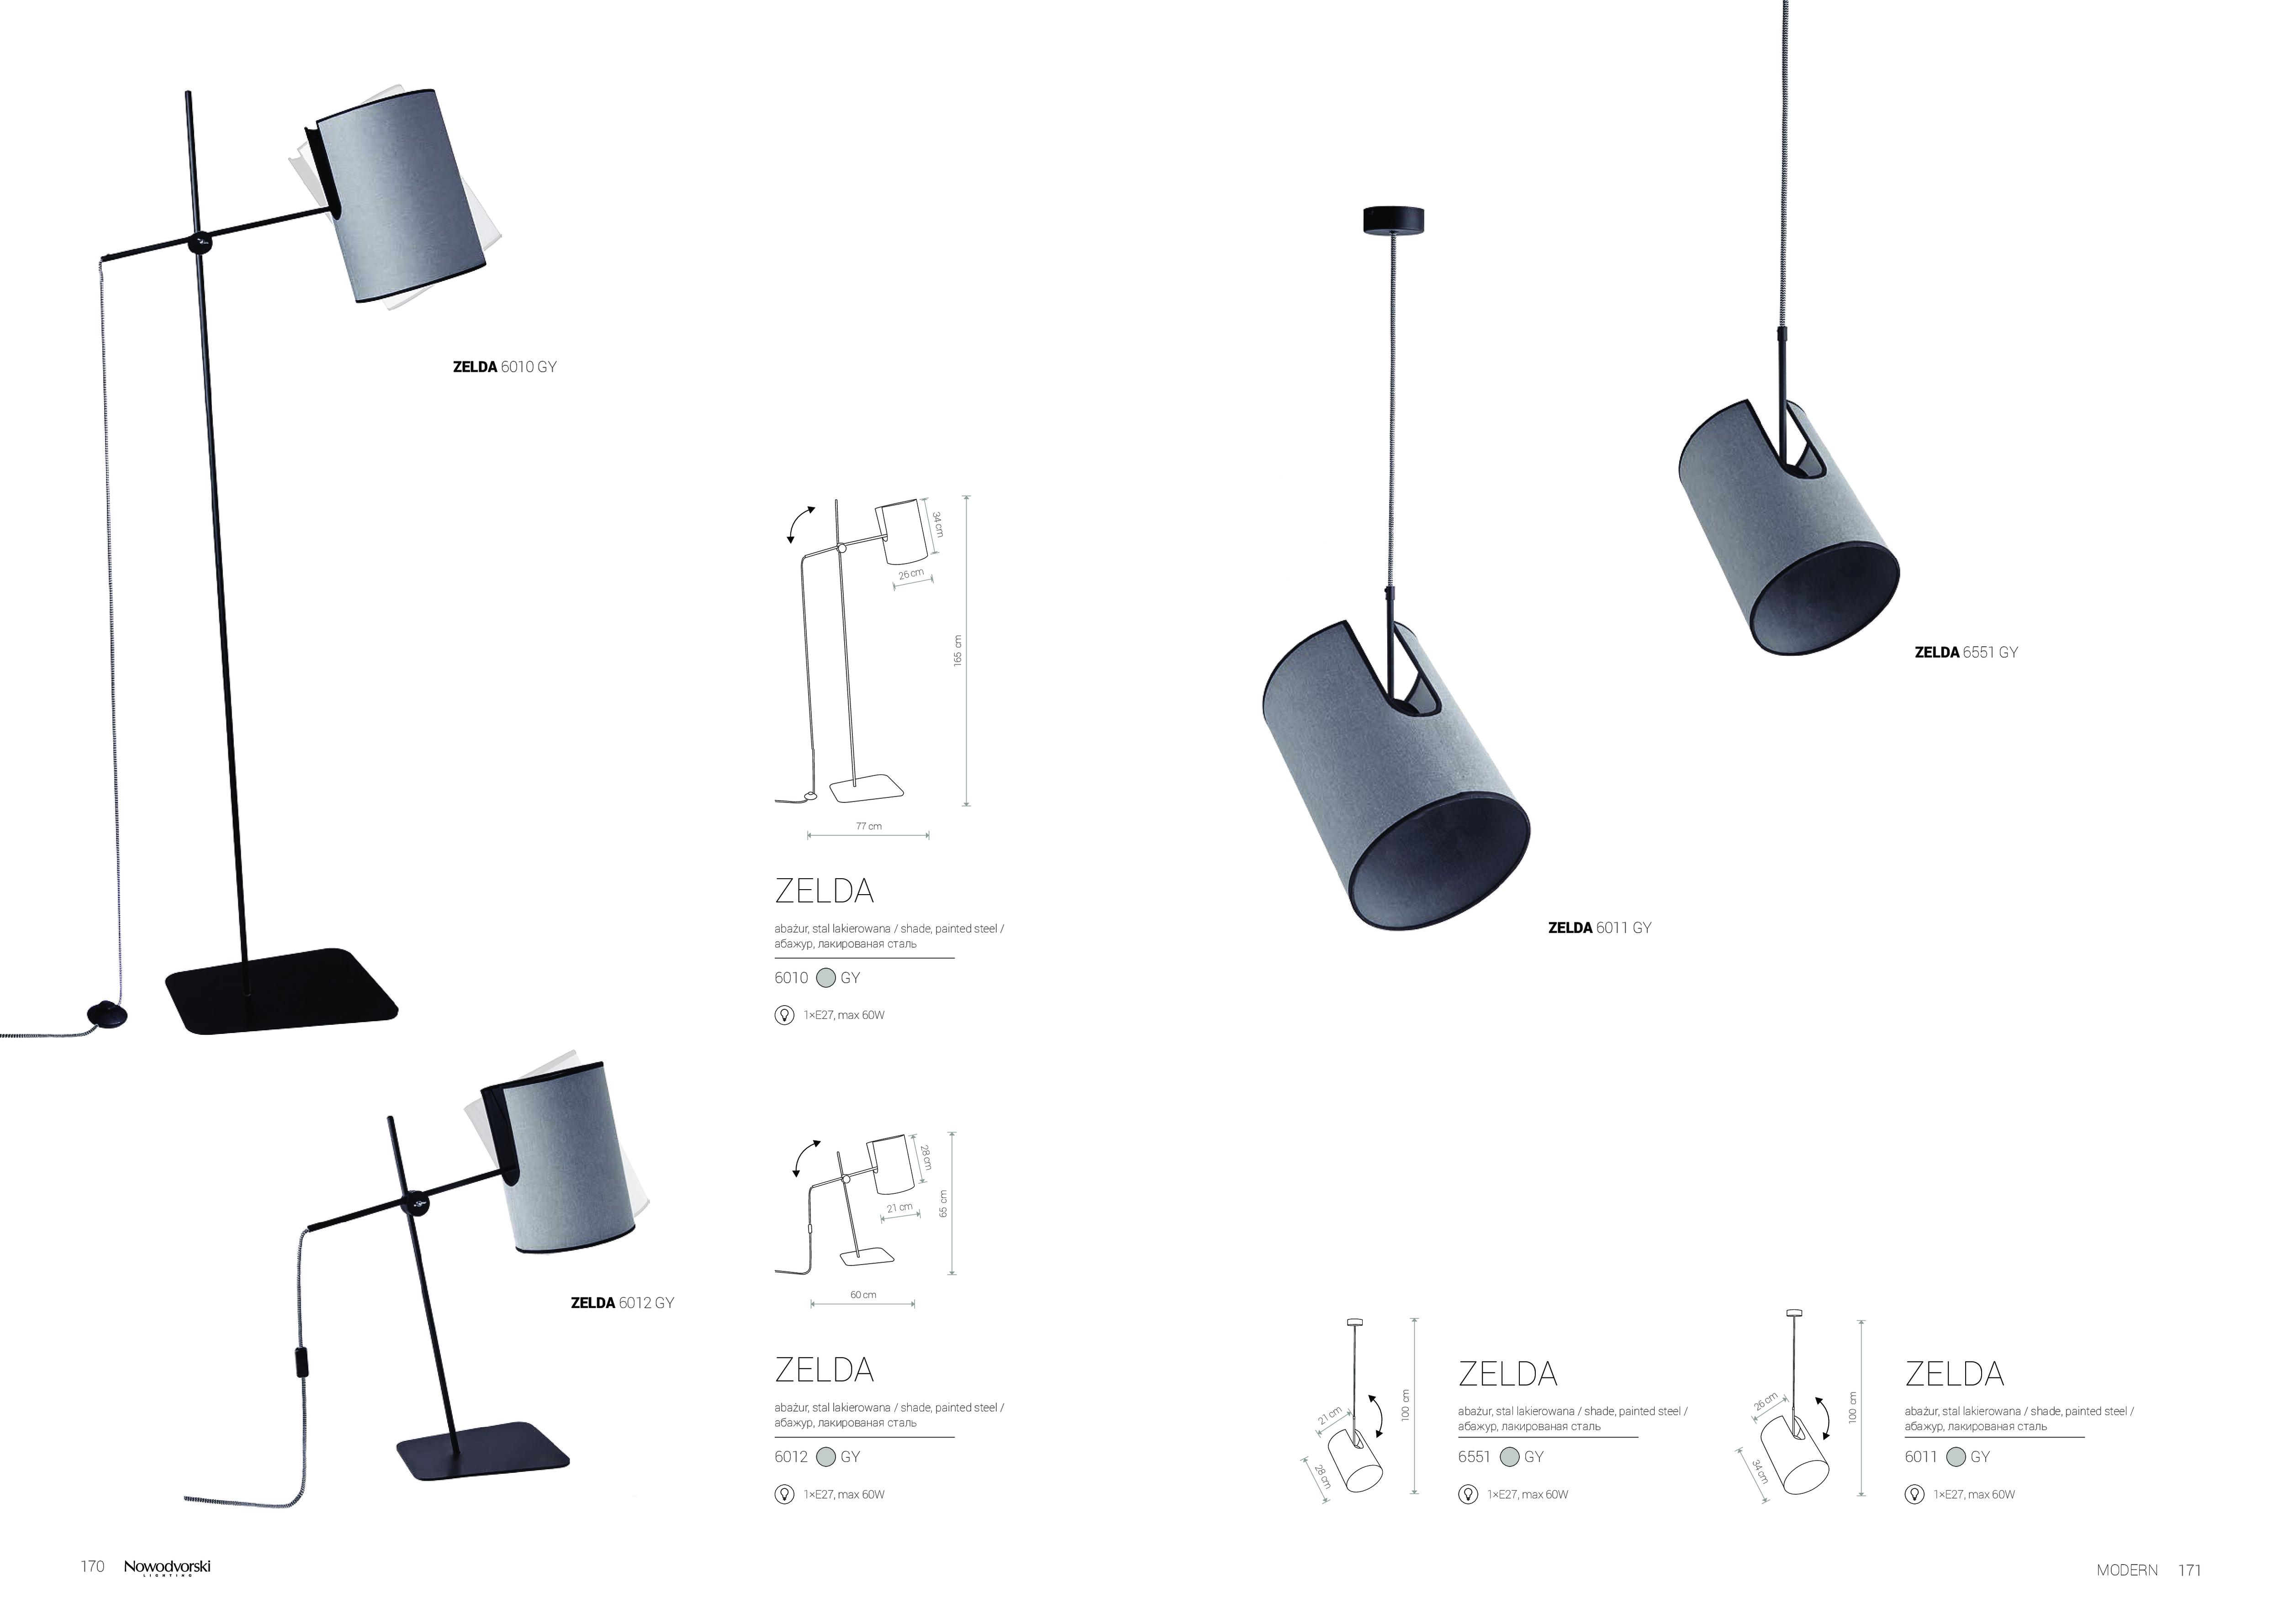 Настольная лампа Nowodvorski Zelda 6012, 1xE27x60W, черный, серый, металл, текстиль - фото 2